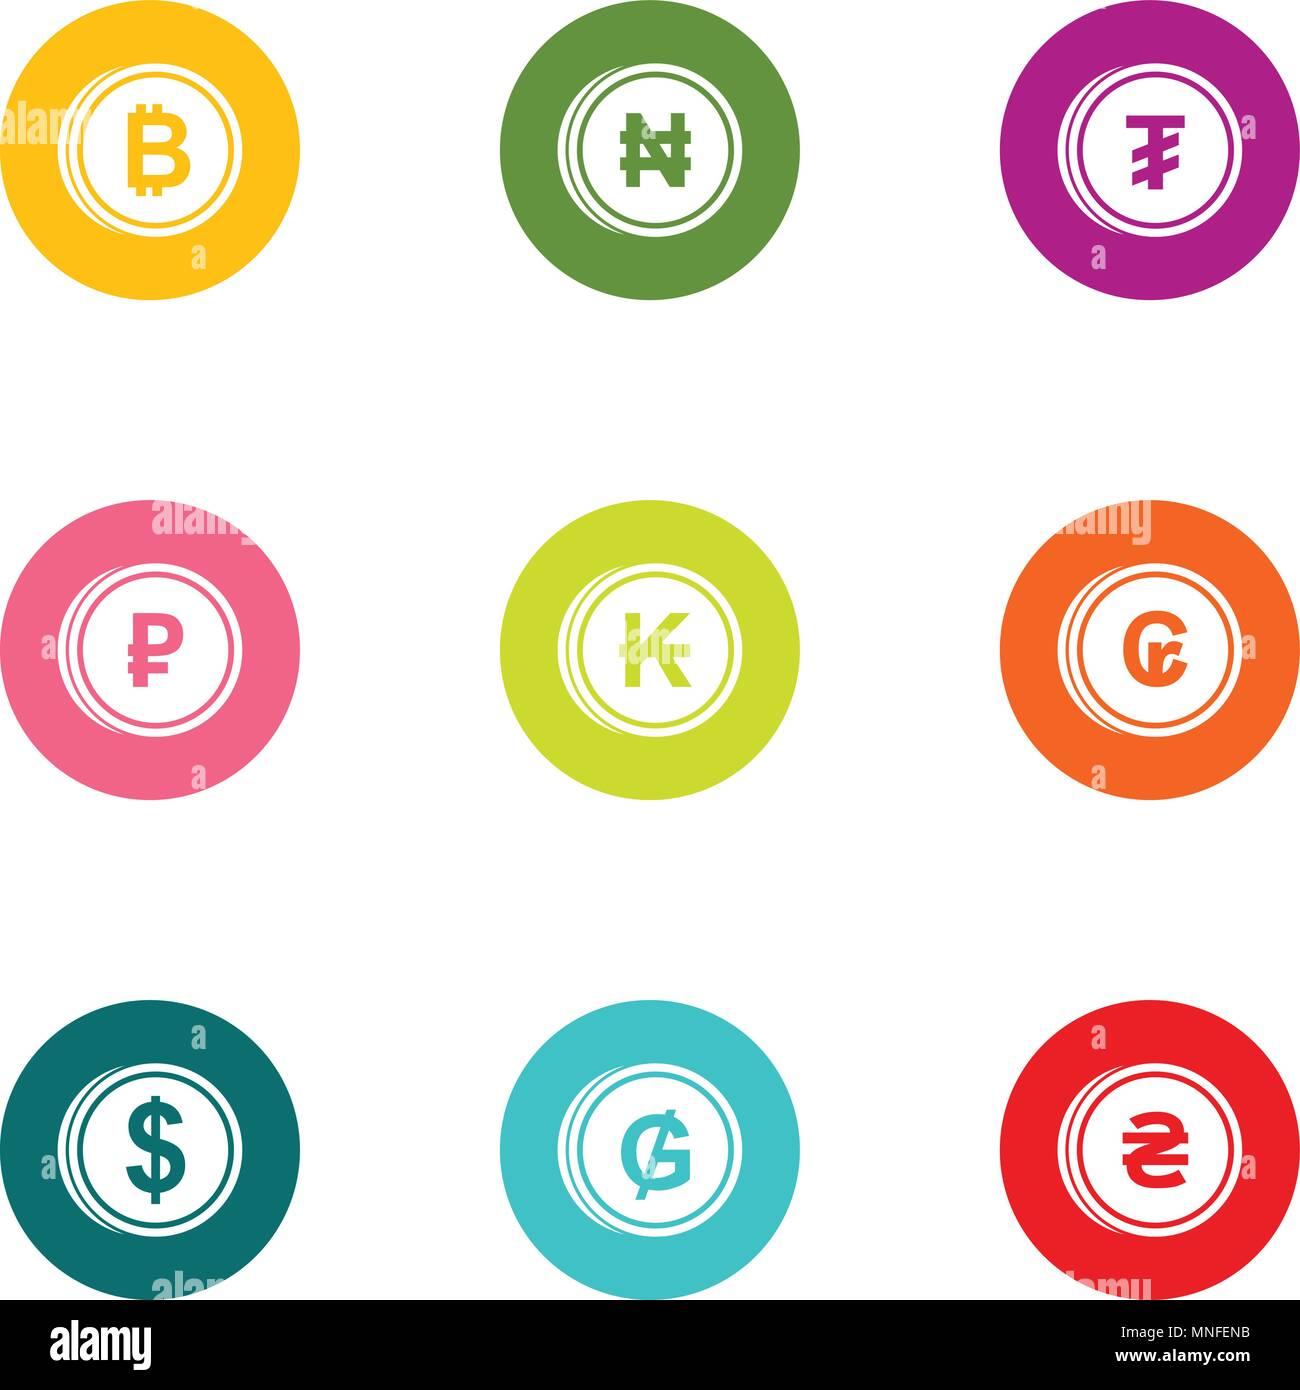 Loot icons set, flat style - Stock Image